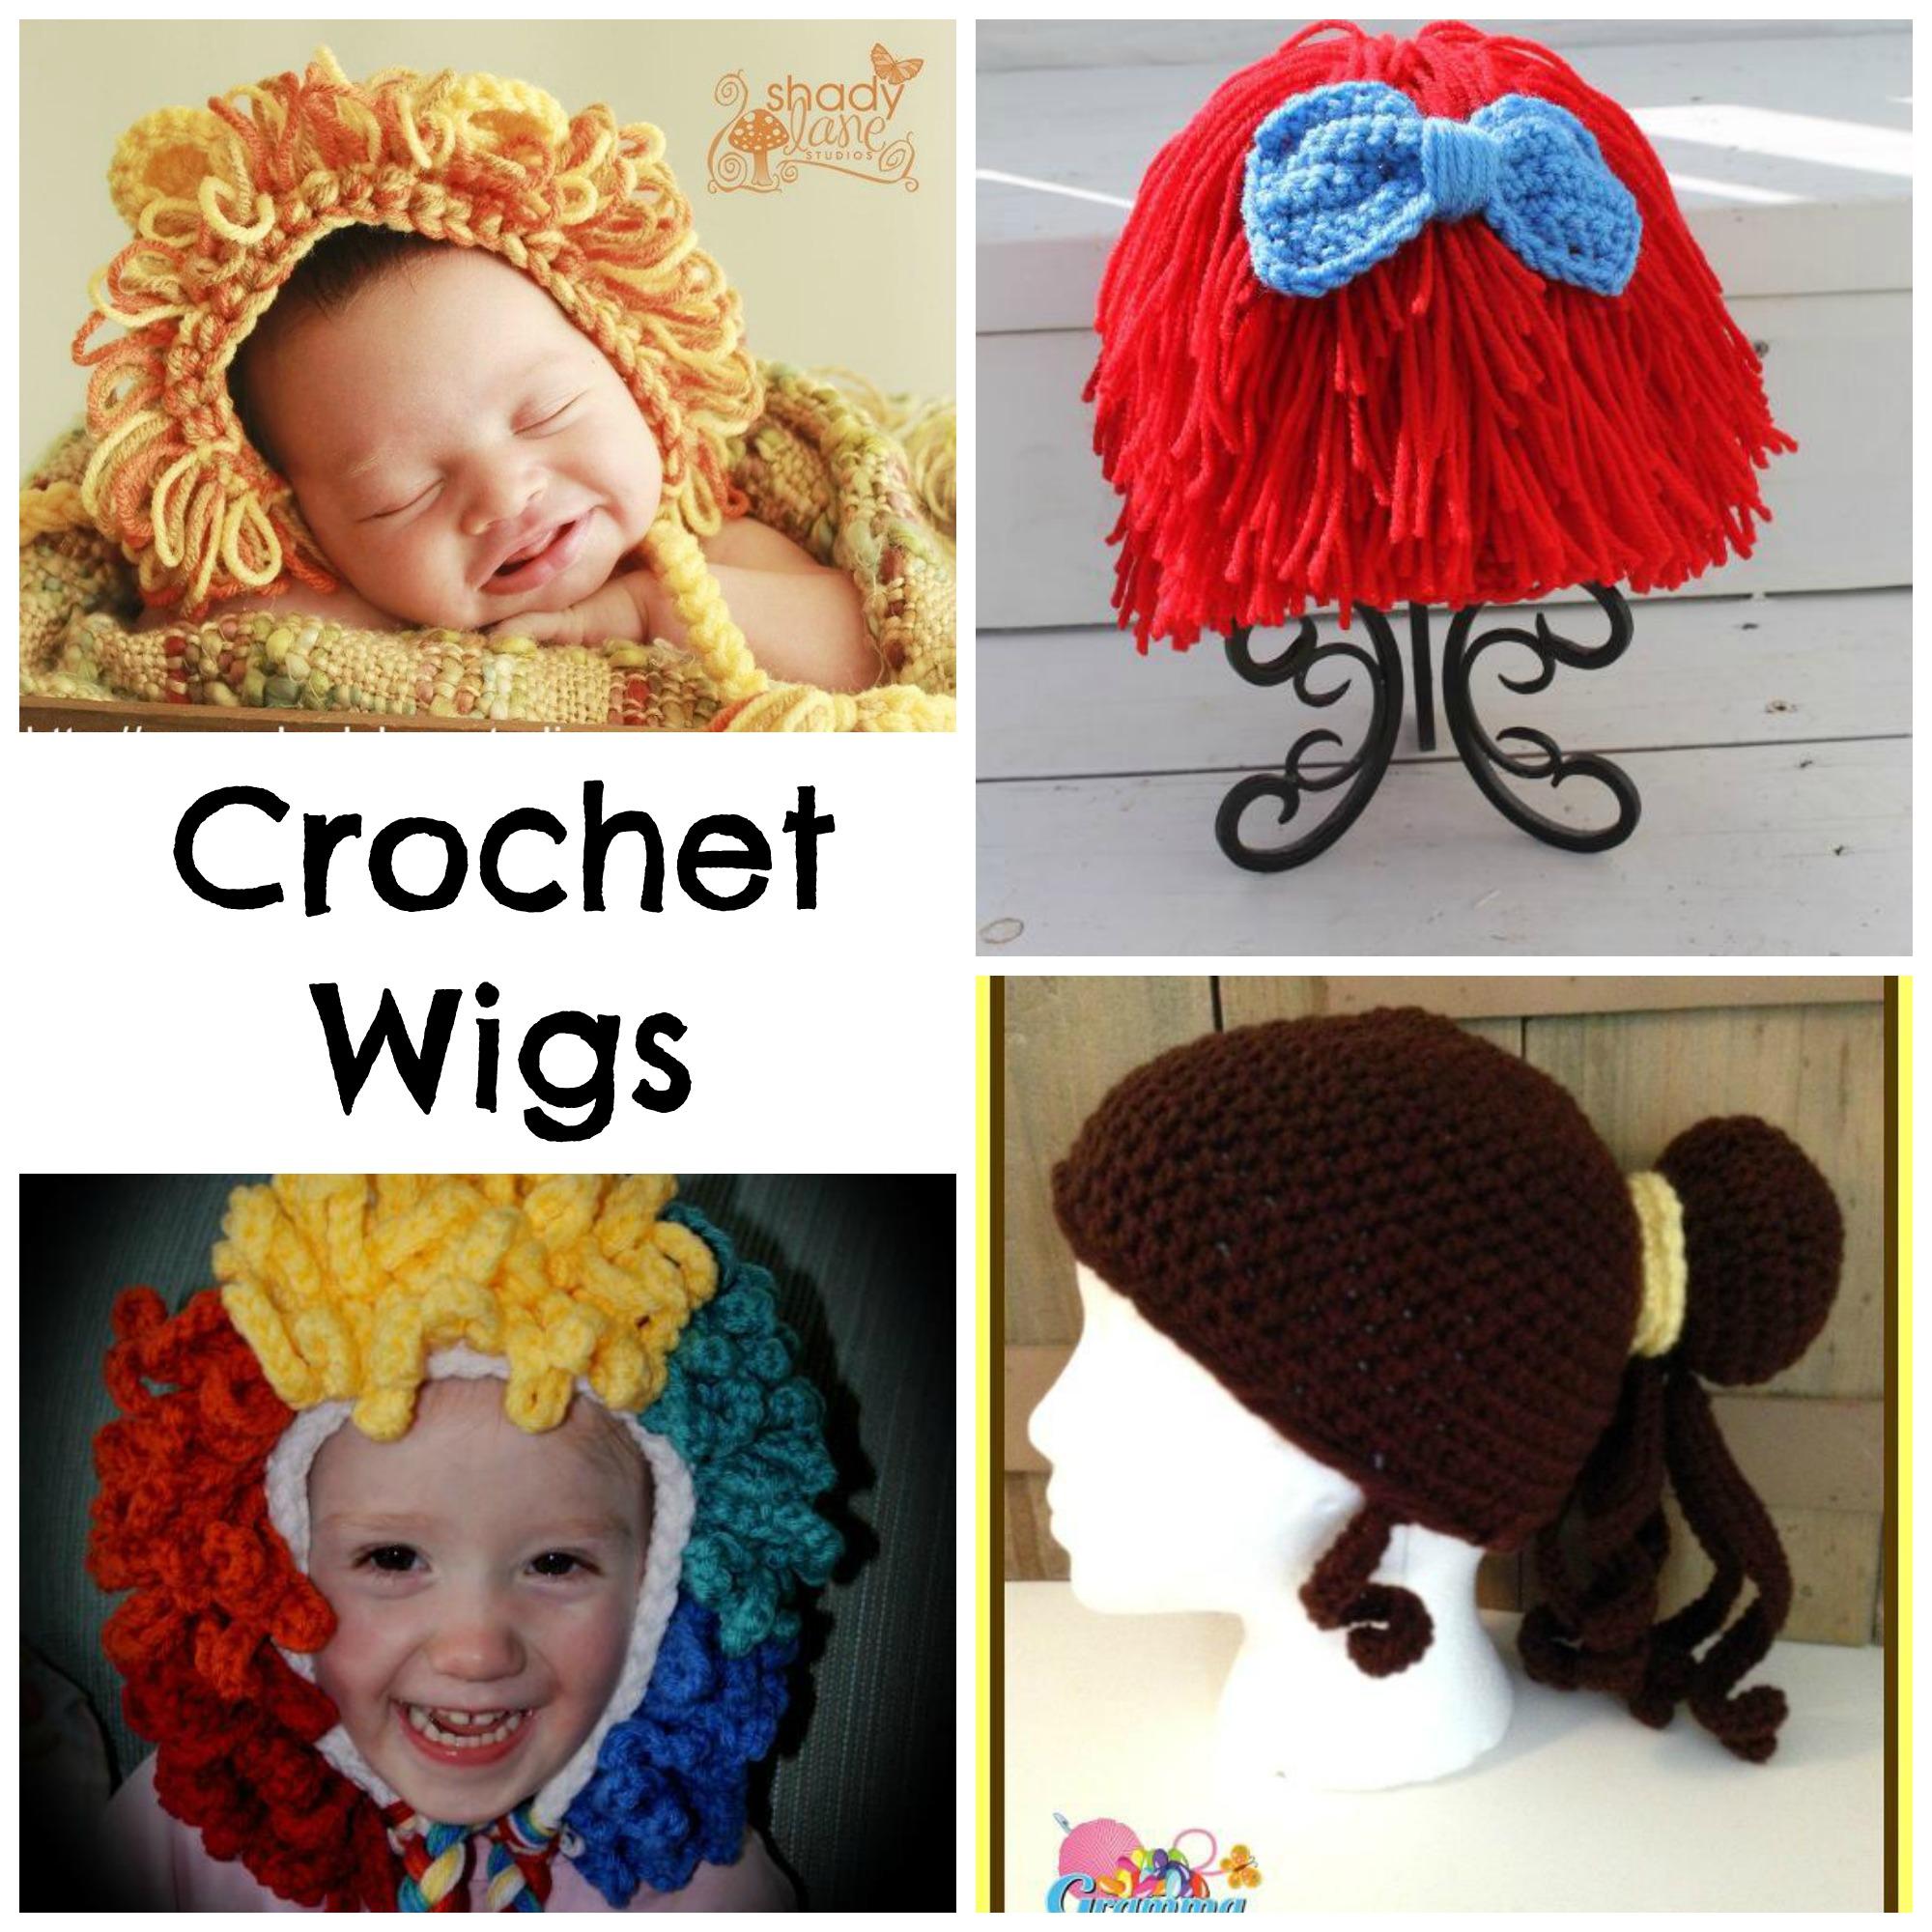 Crochet Wigs for Halloween